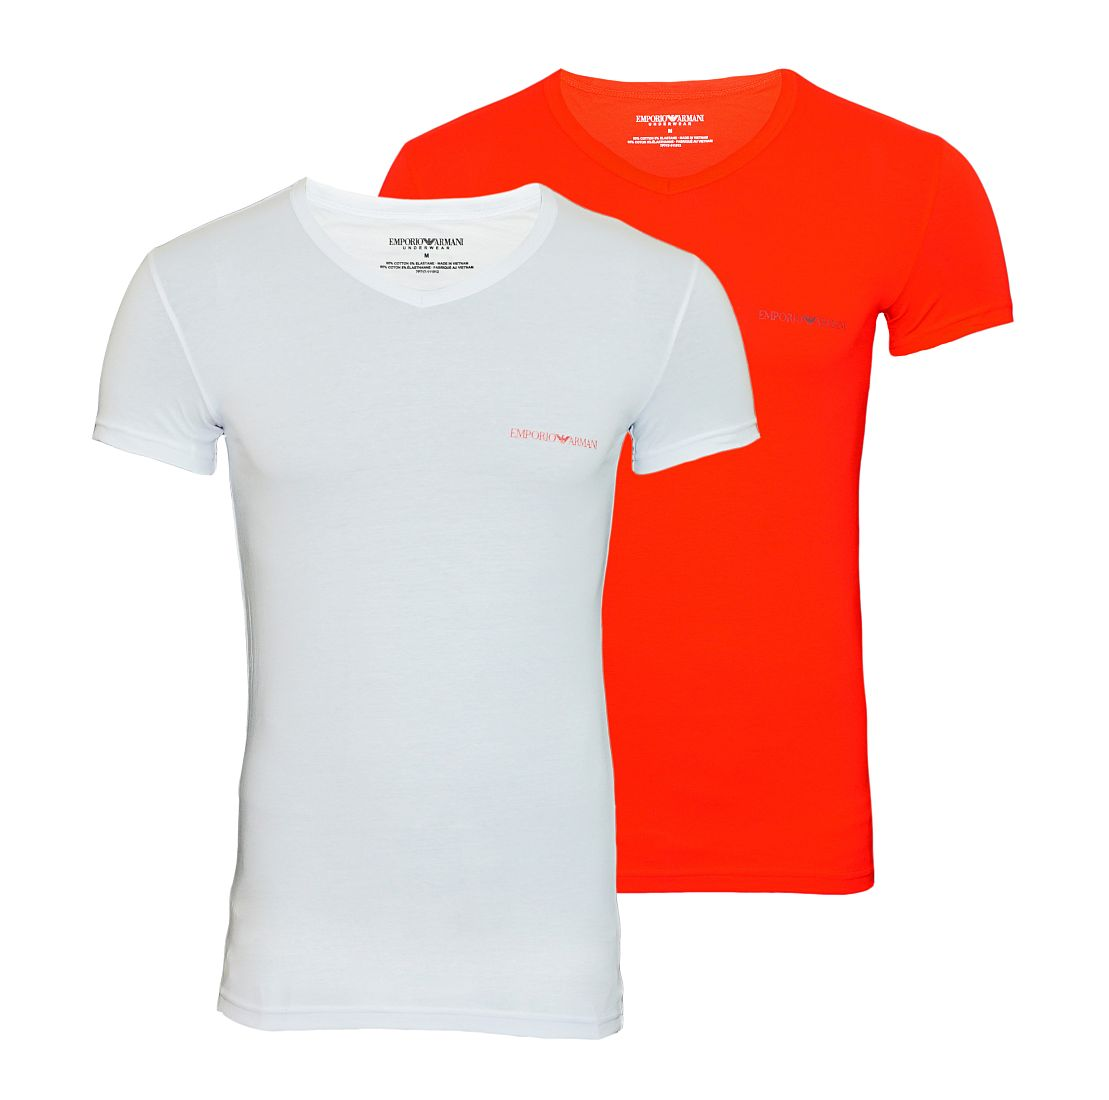 EMPORIO ARMANI 2er Pack Shirts T-Shirt BIANCO/ROSSO 111512 7P717 01010 WF17-EATS1